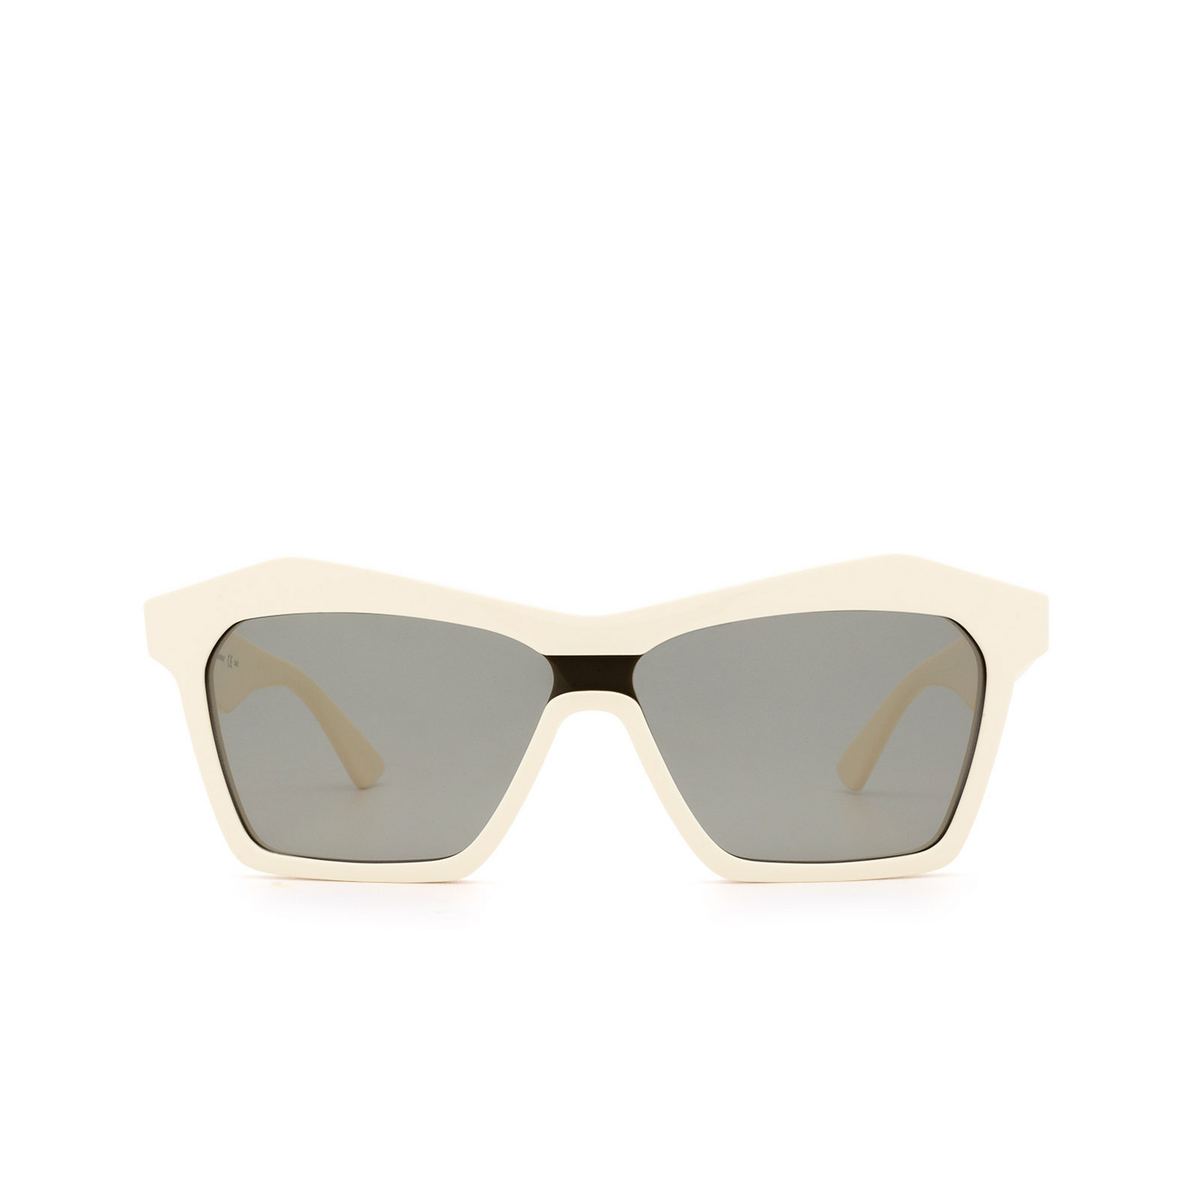 Bottega Veneta® Irregular Sunglasses: BV1093S color Ivory 003 - 1/3.